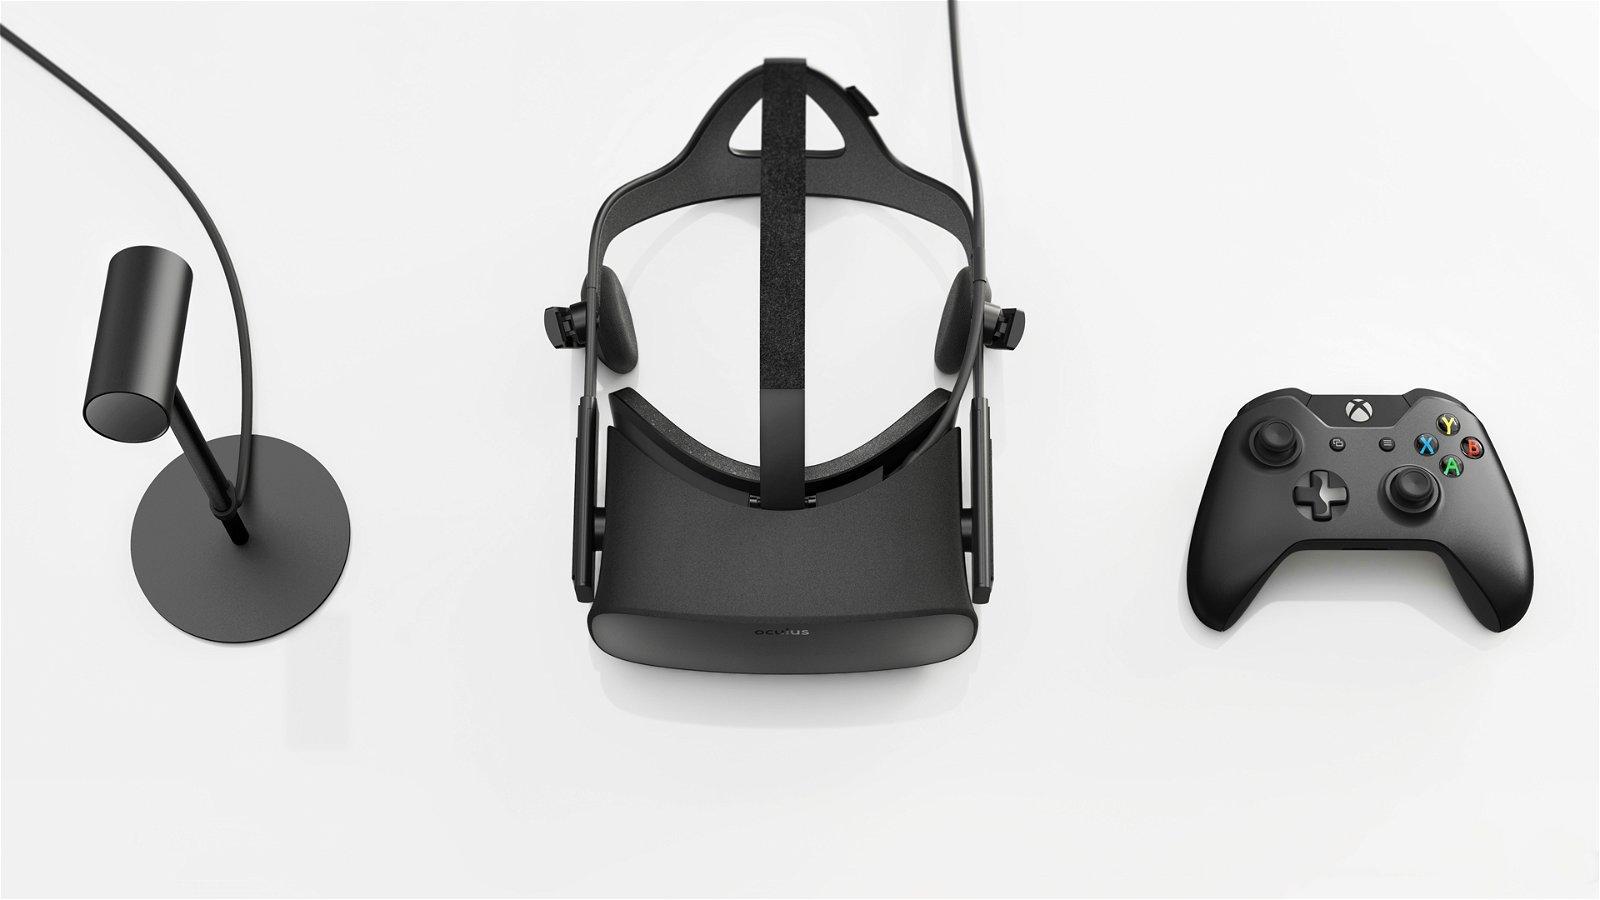 Valve Employee Claims Oculus Is Using Tech Valve Lent Them 2